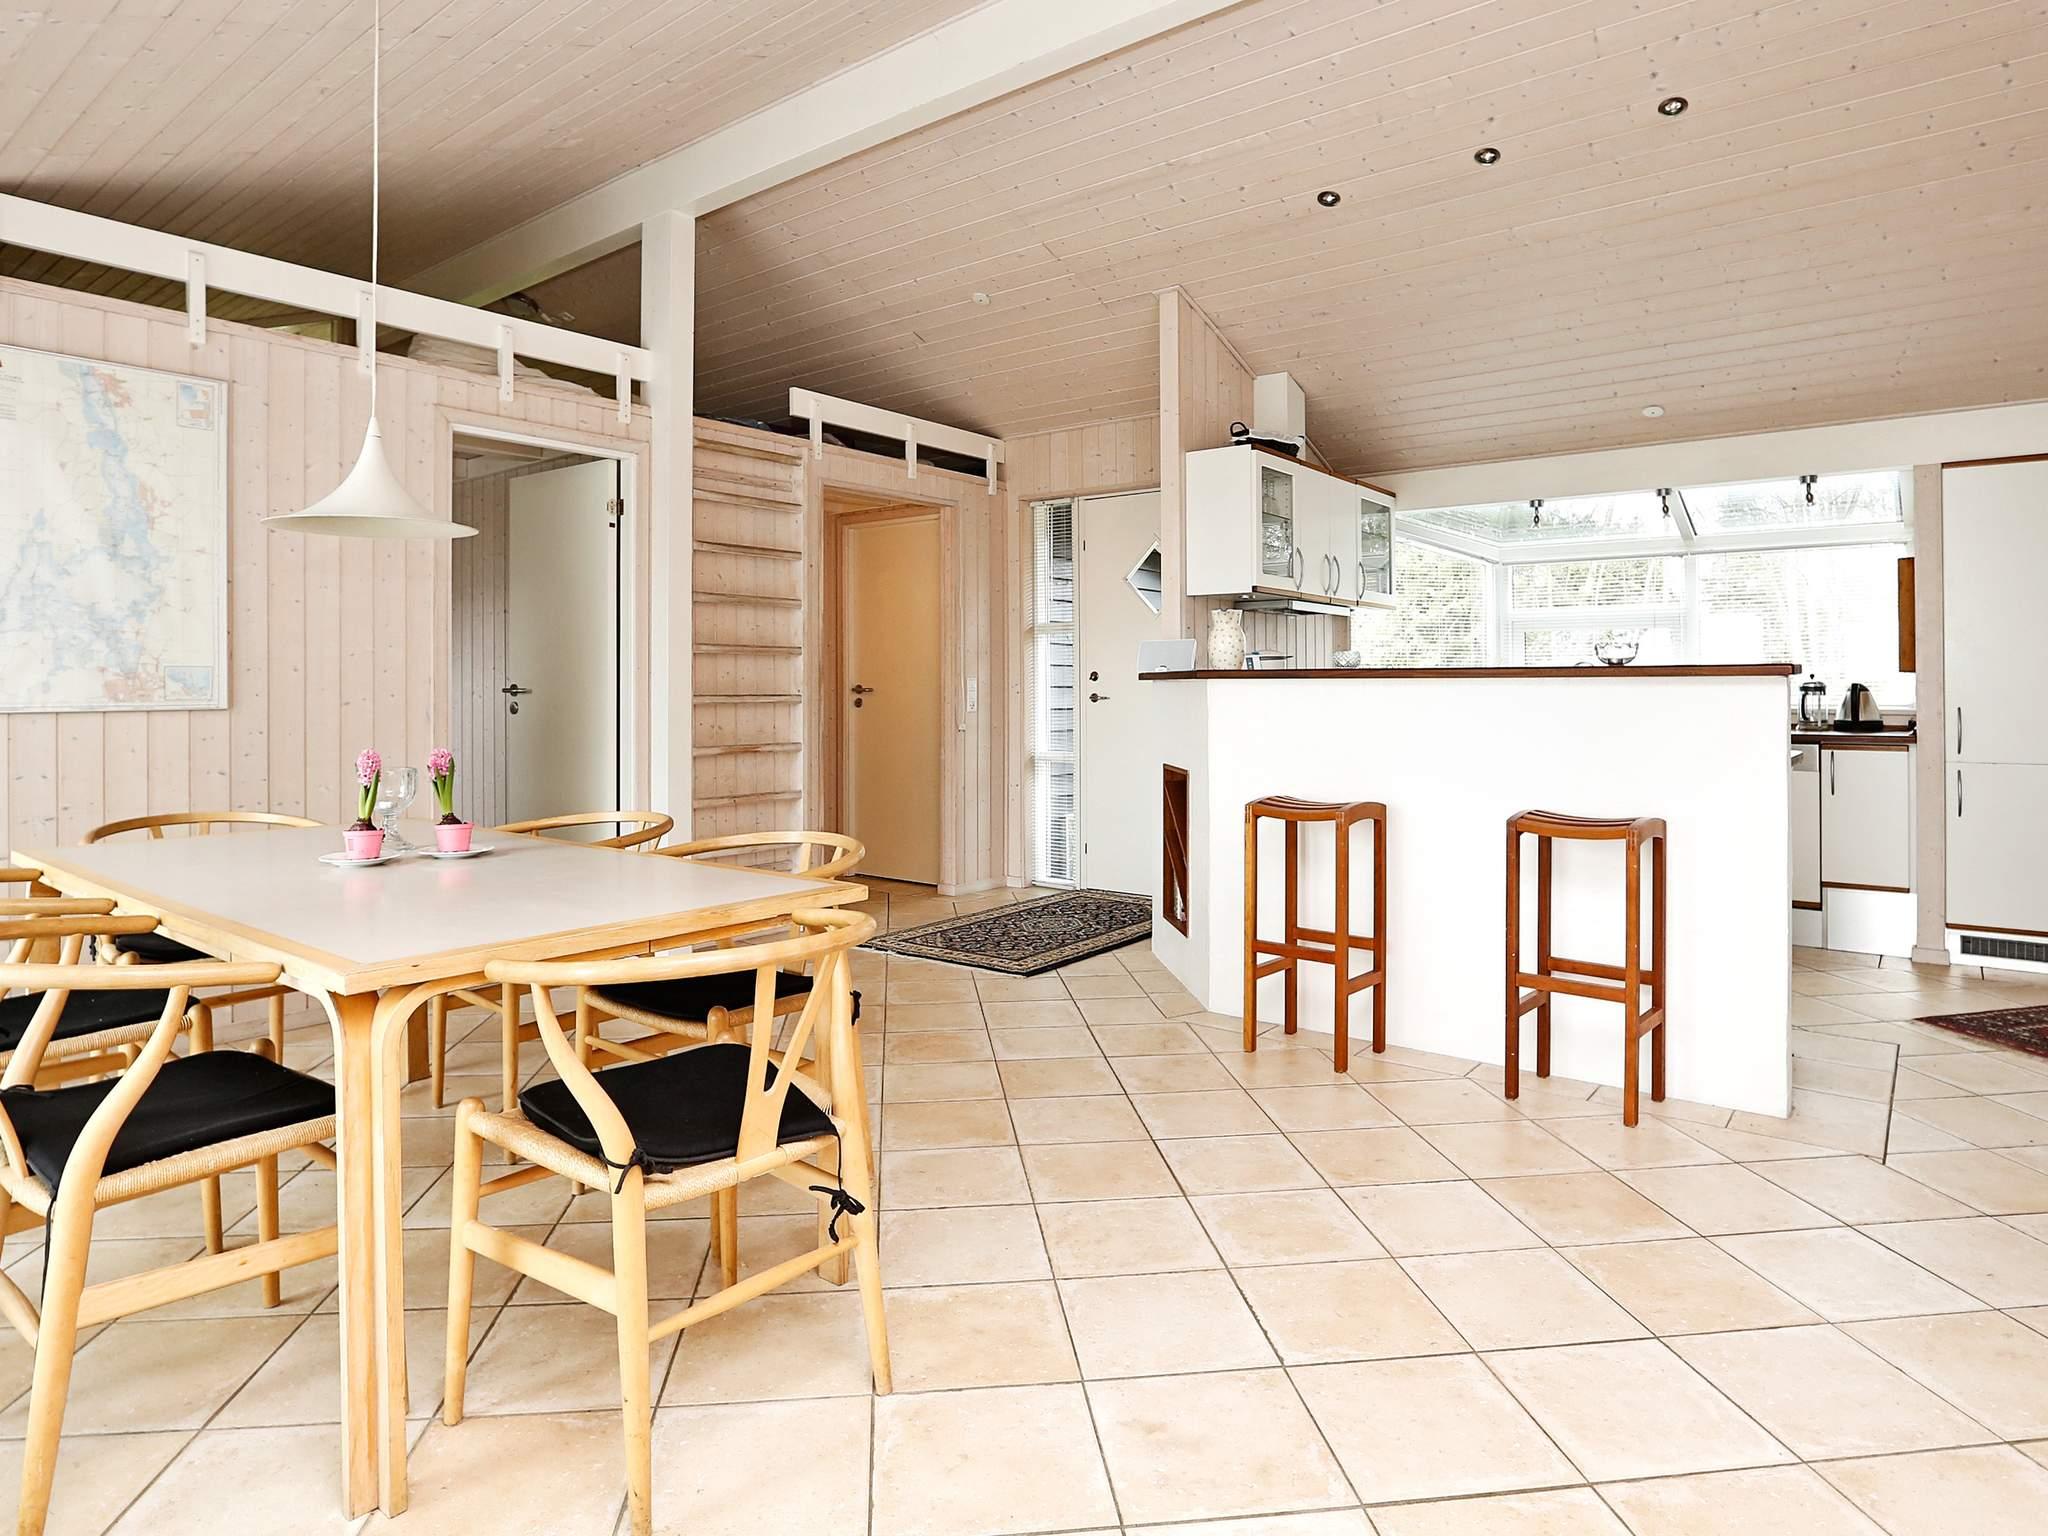 Maison de vacances Skibby (124927), Kirke Hyllinge, , Seeland Nord, Danemark, image 6